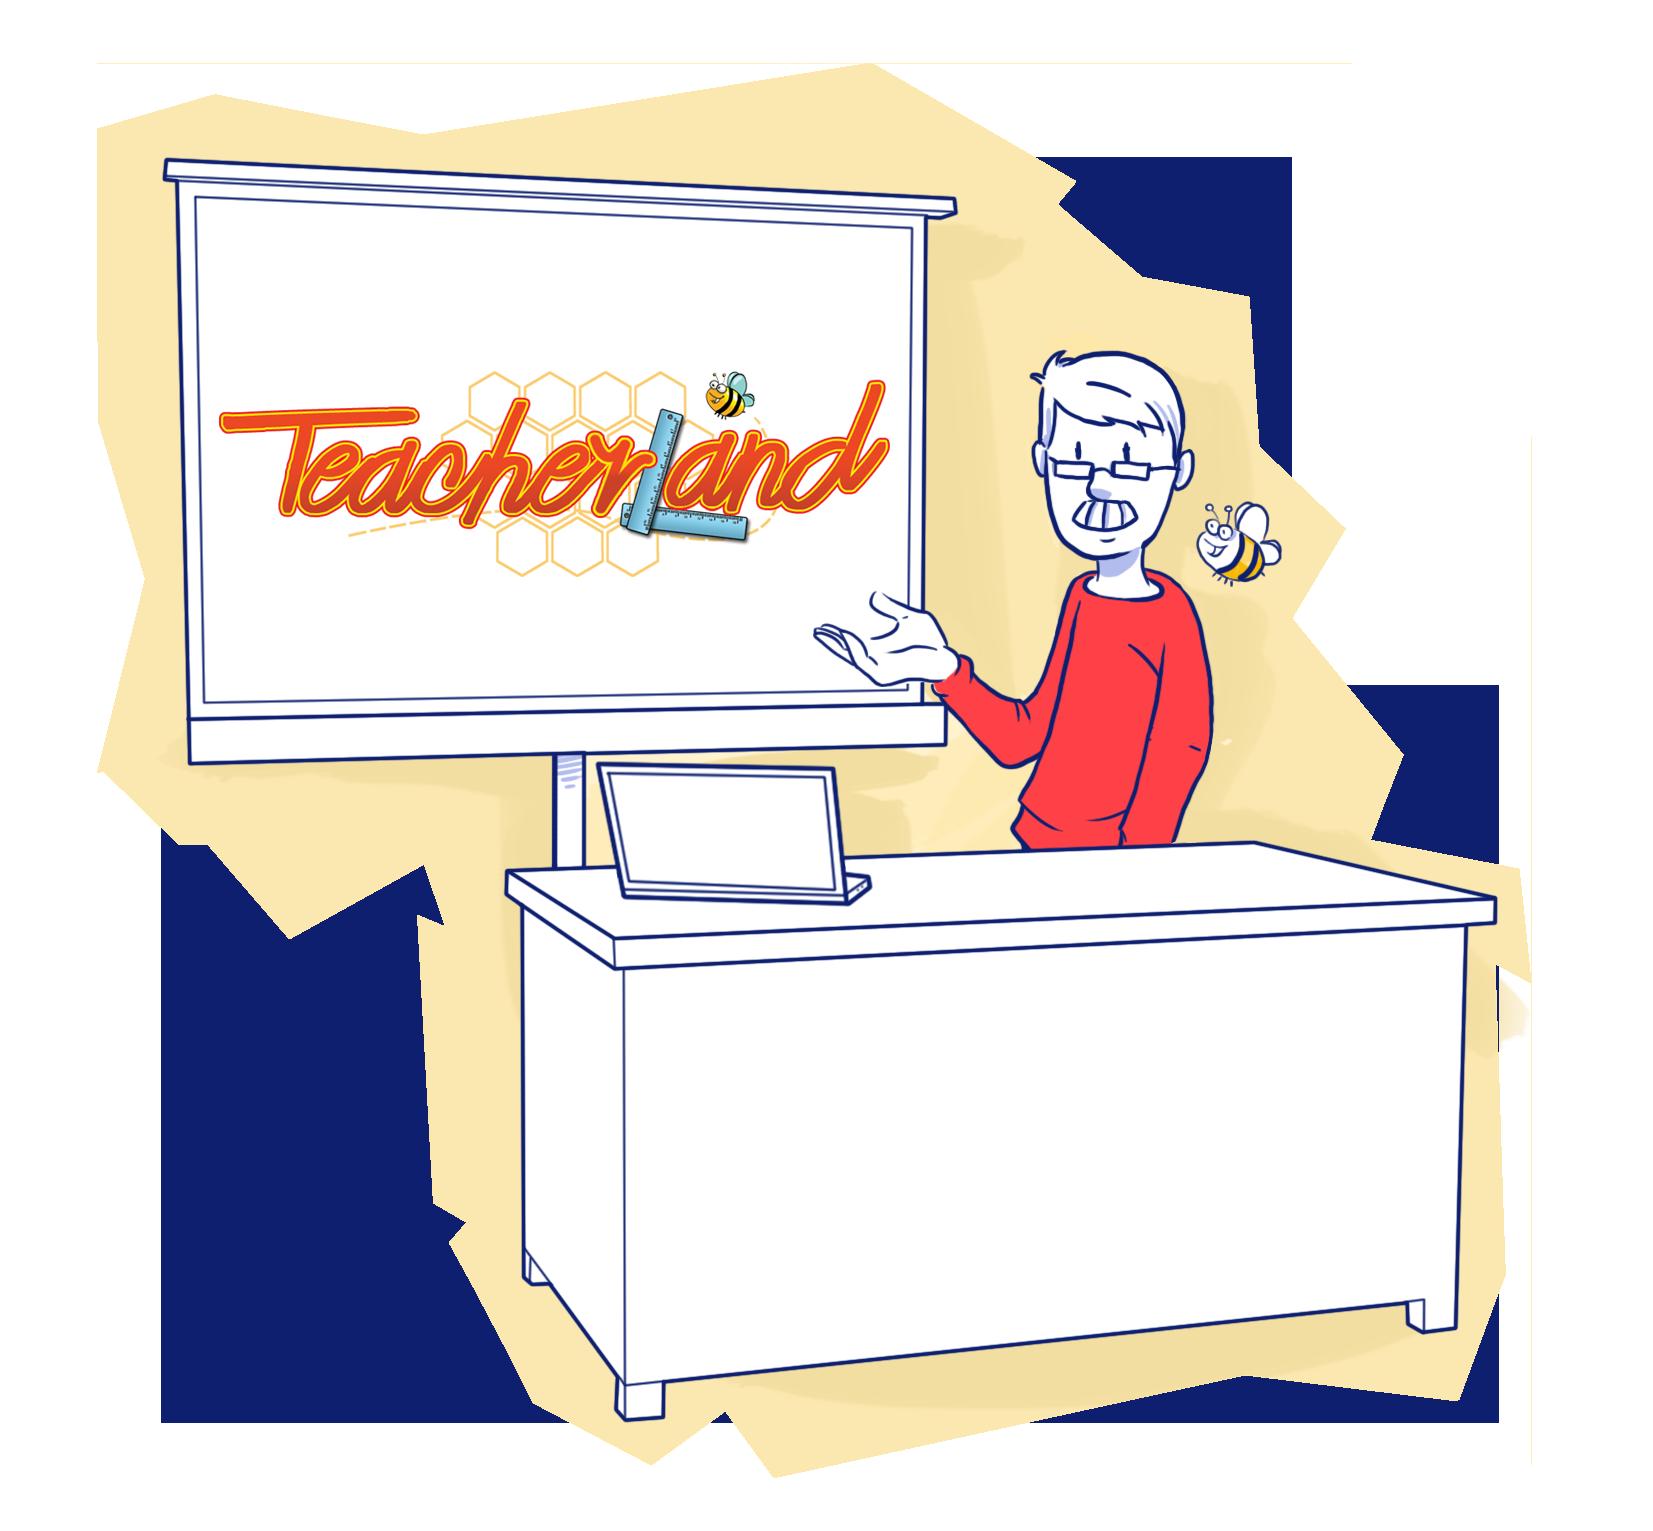 teacherland εκπαιδευτικό υλικό δημοτικό